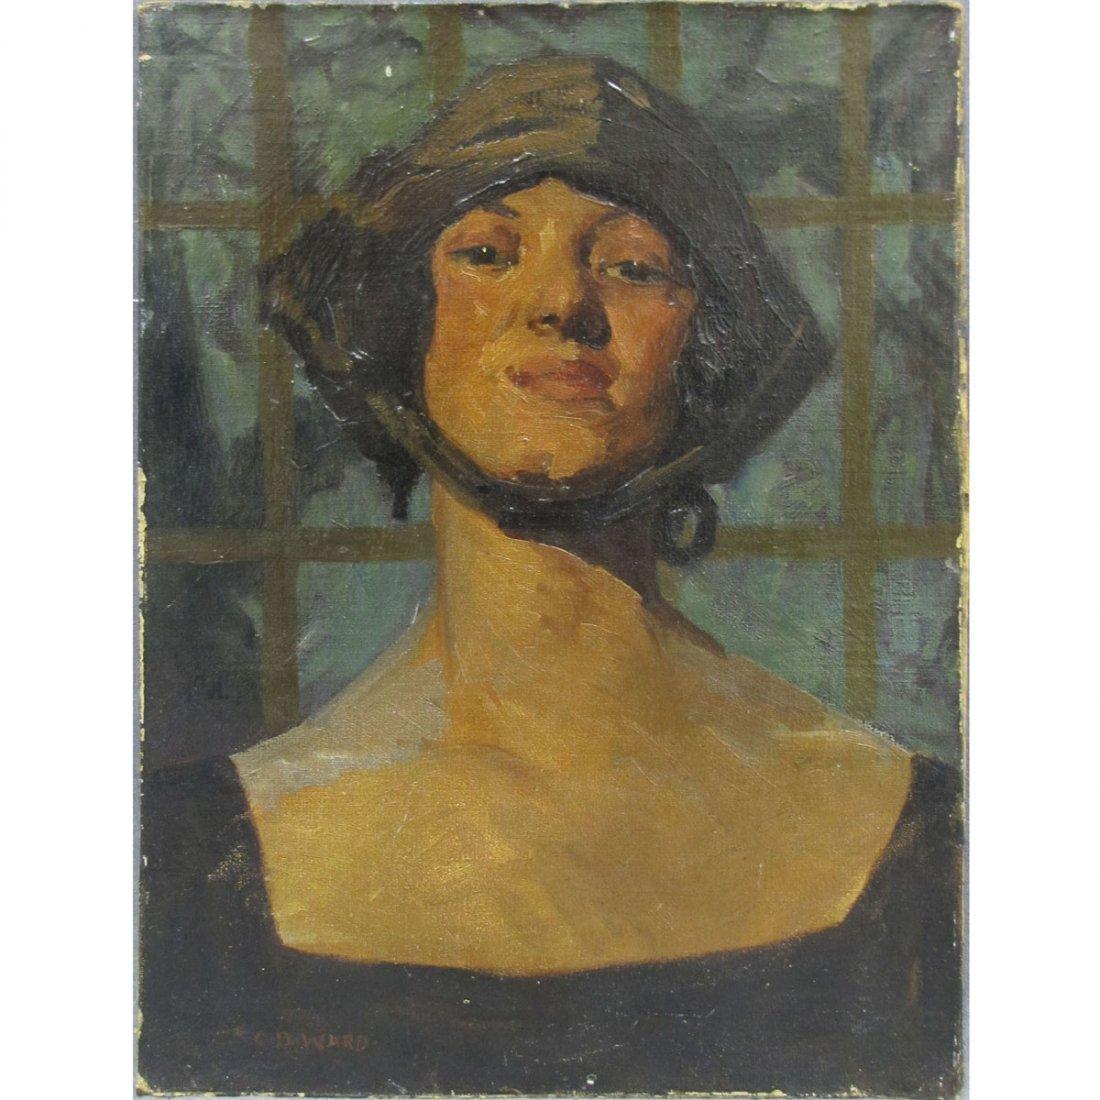 78: CHARLES D. WARD (ENGLAND 1872-1935), OIL ON CANVAS